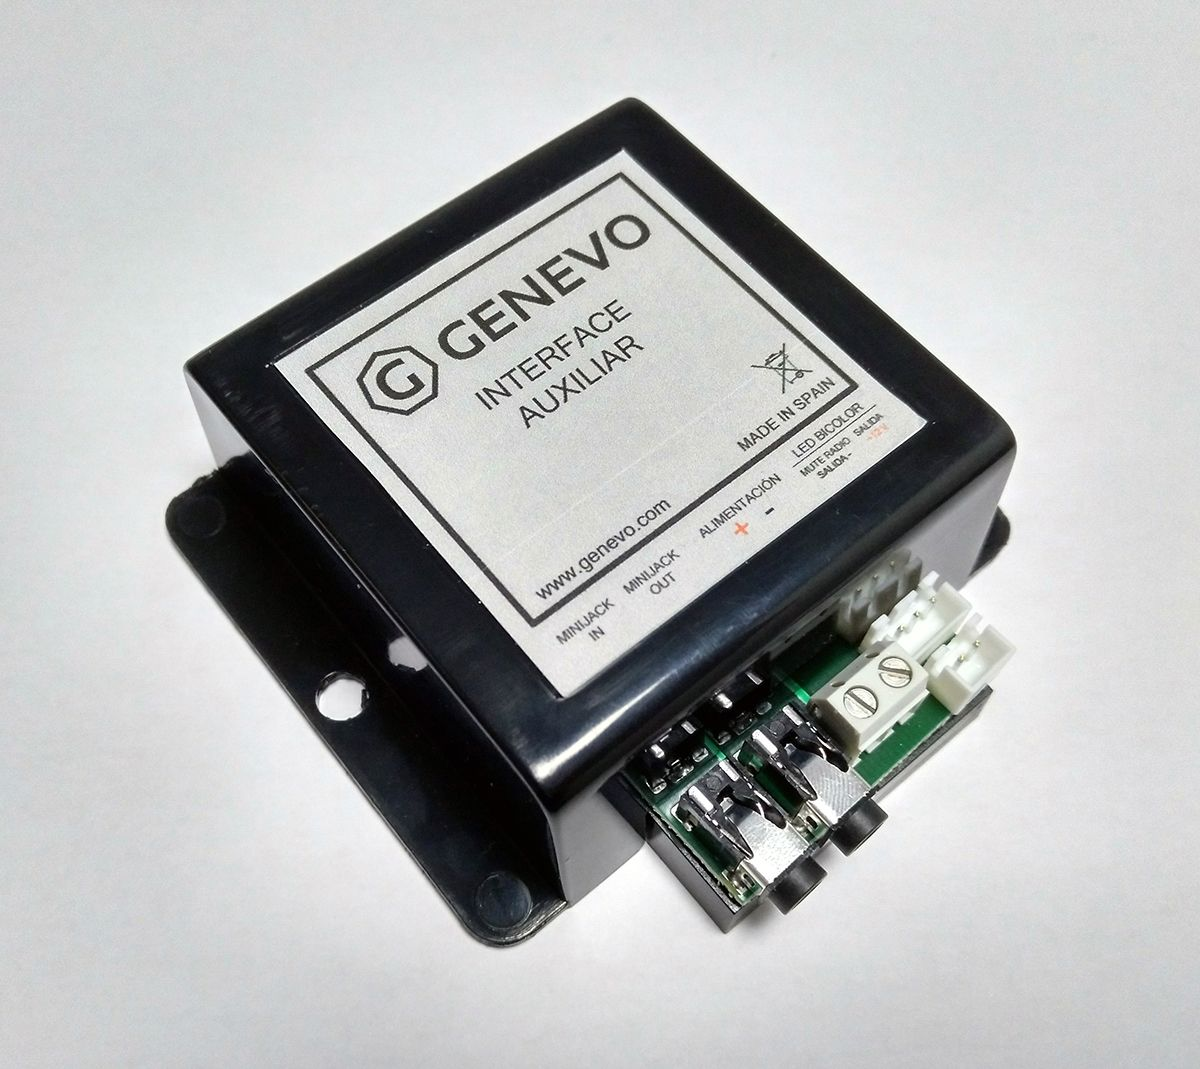 Interface auxiliar alerta Genevo detector radar